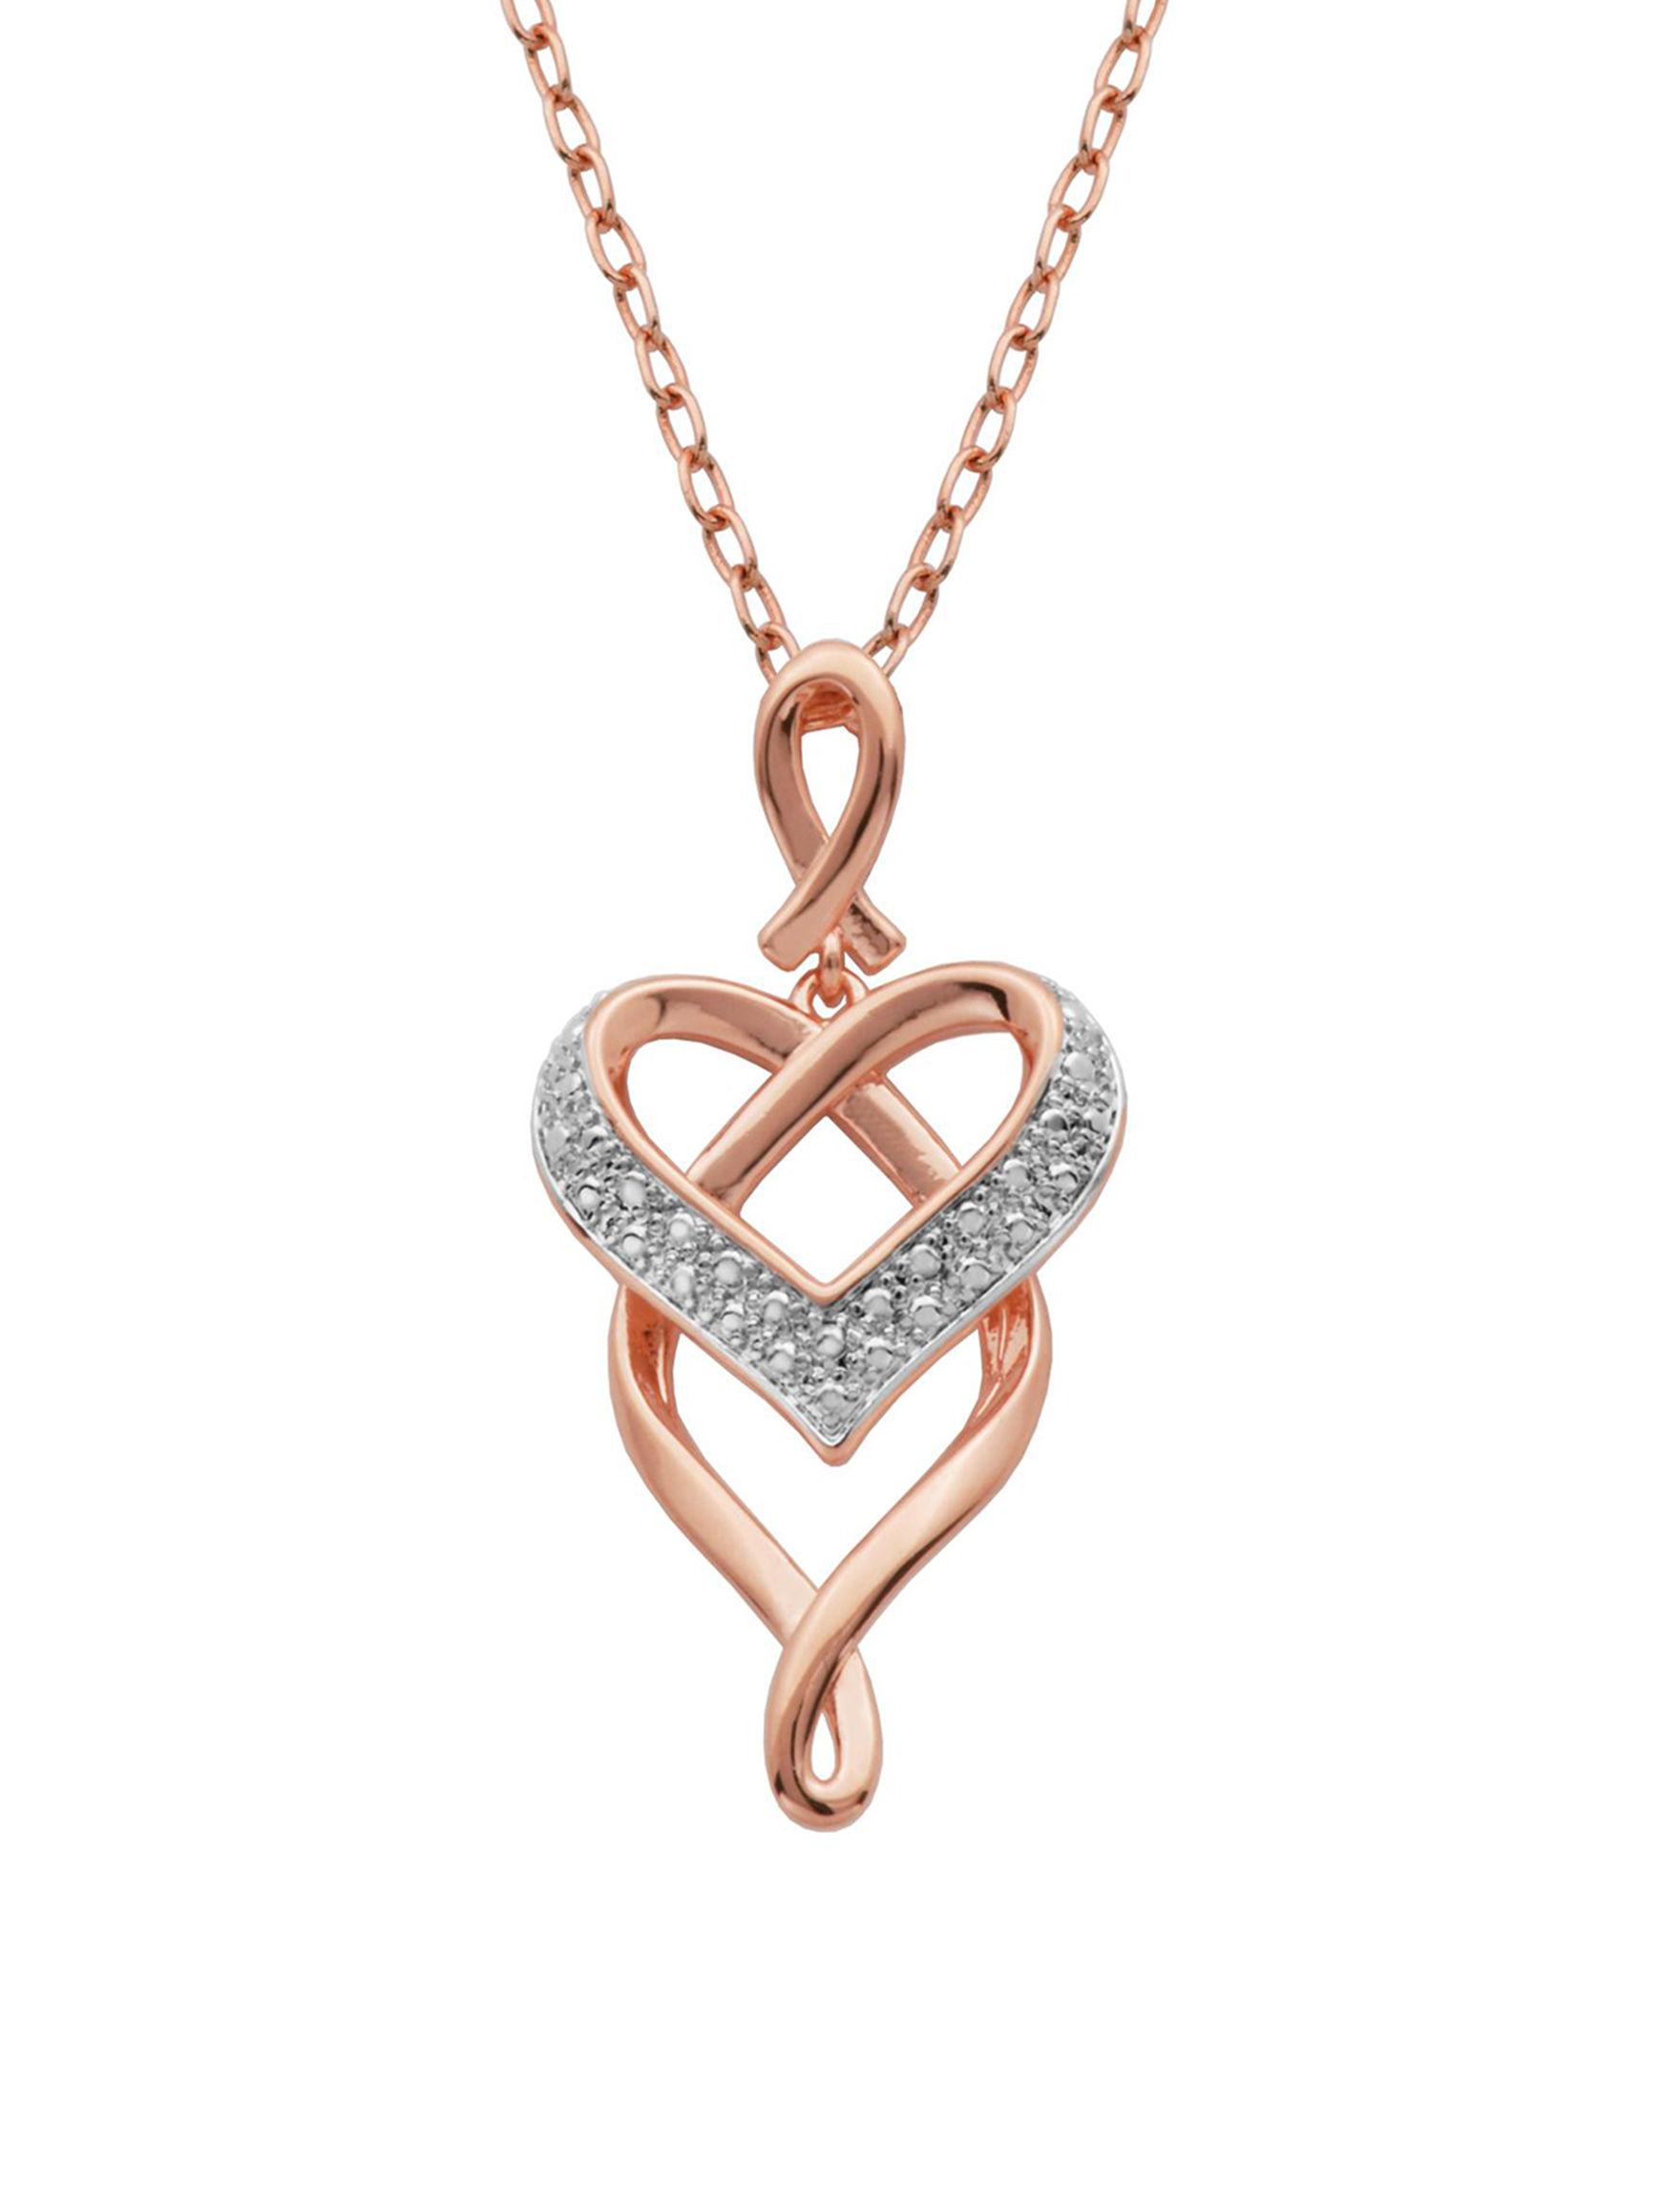 PAJ INC. Diamonds Necklaces & Pendants Fine Jewelry